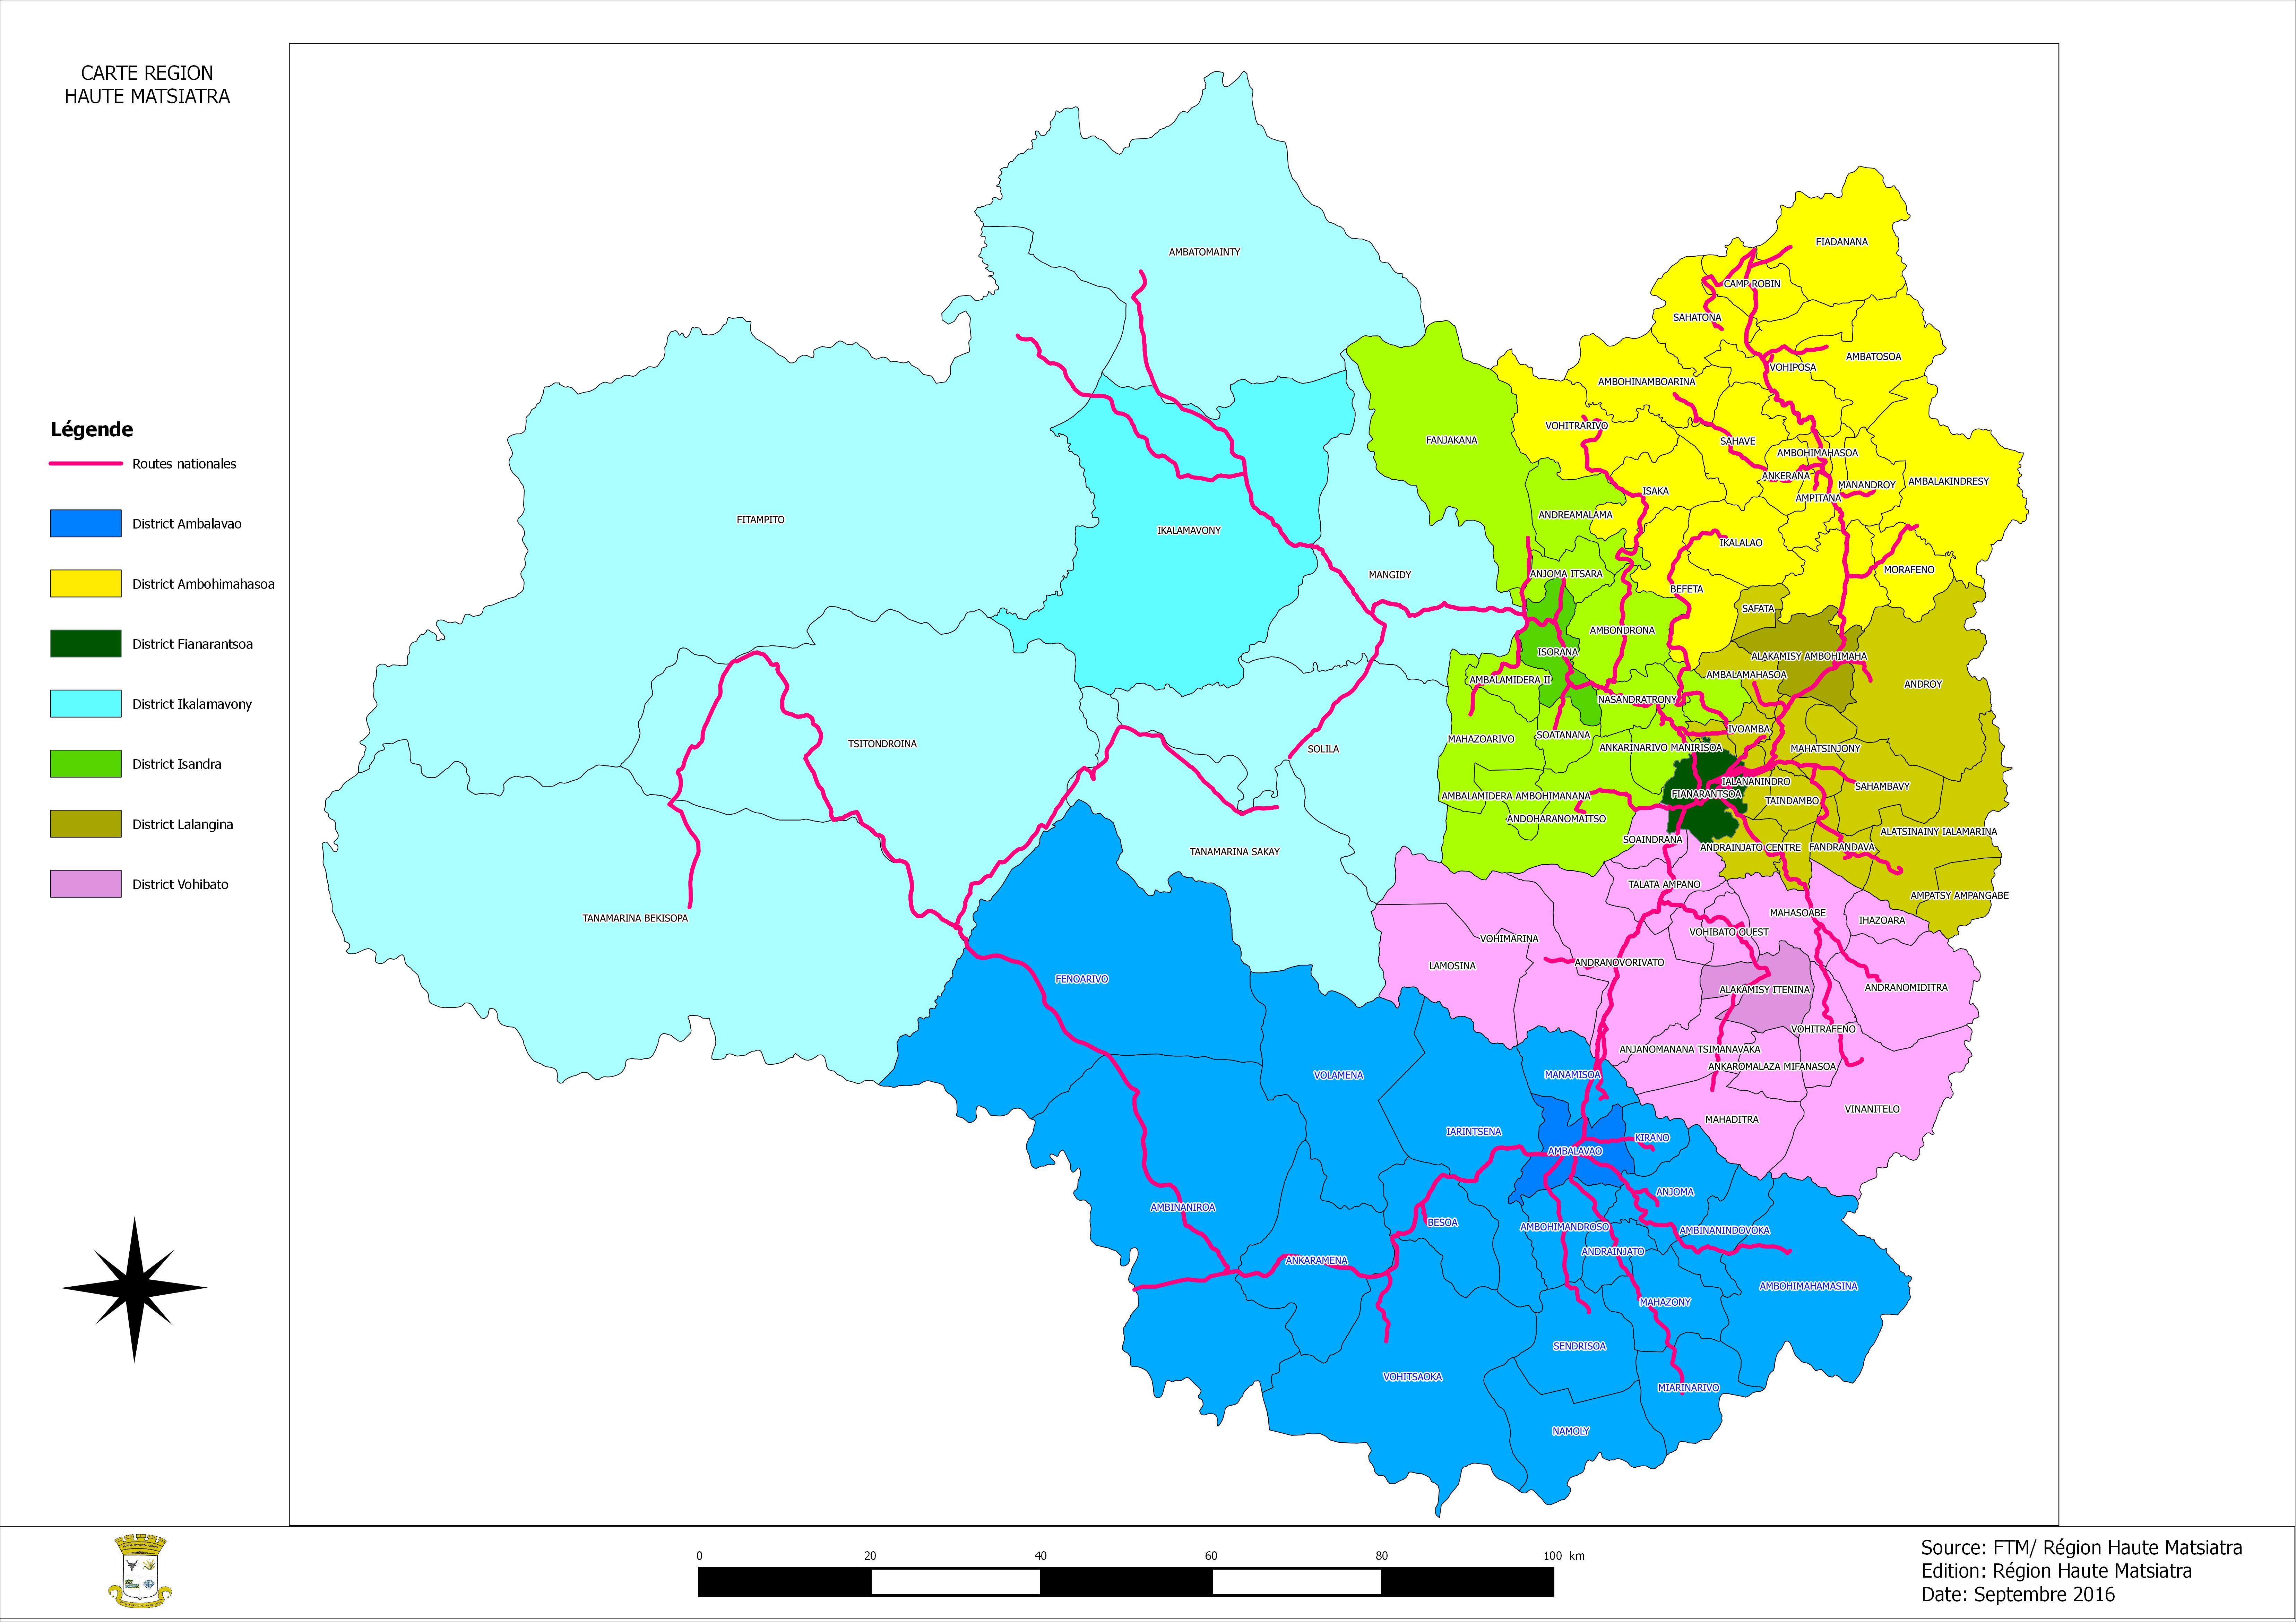 Carte Région Haute Matsiatra